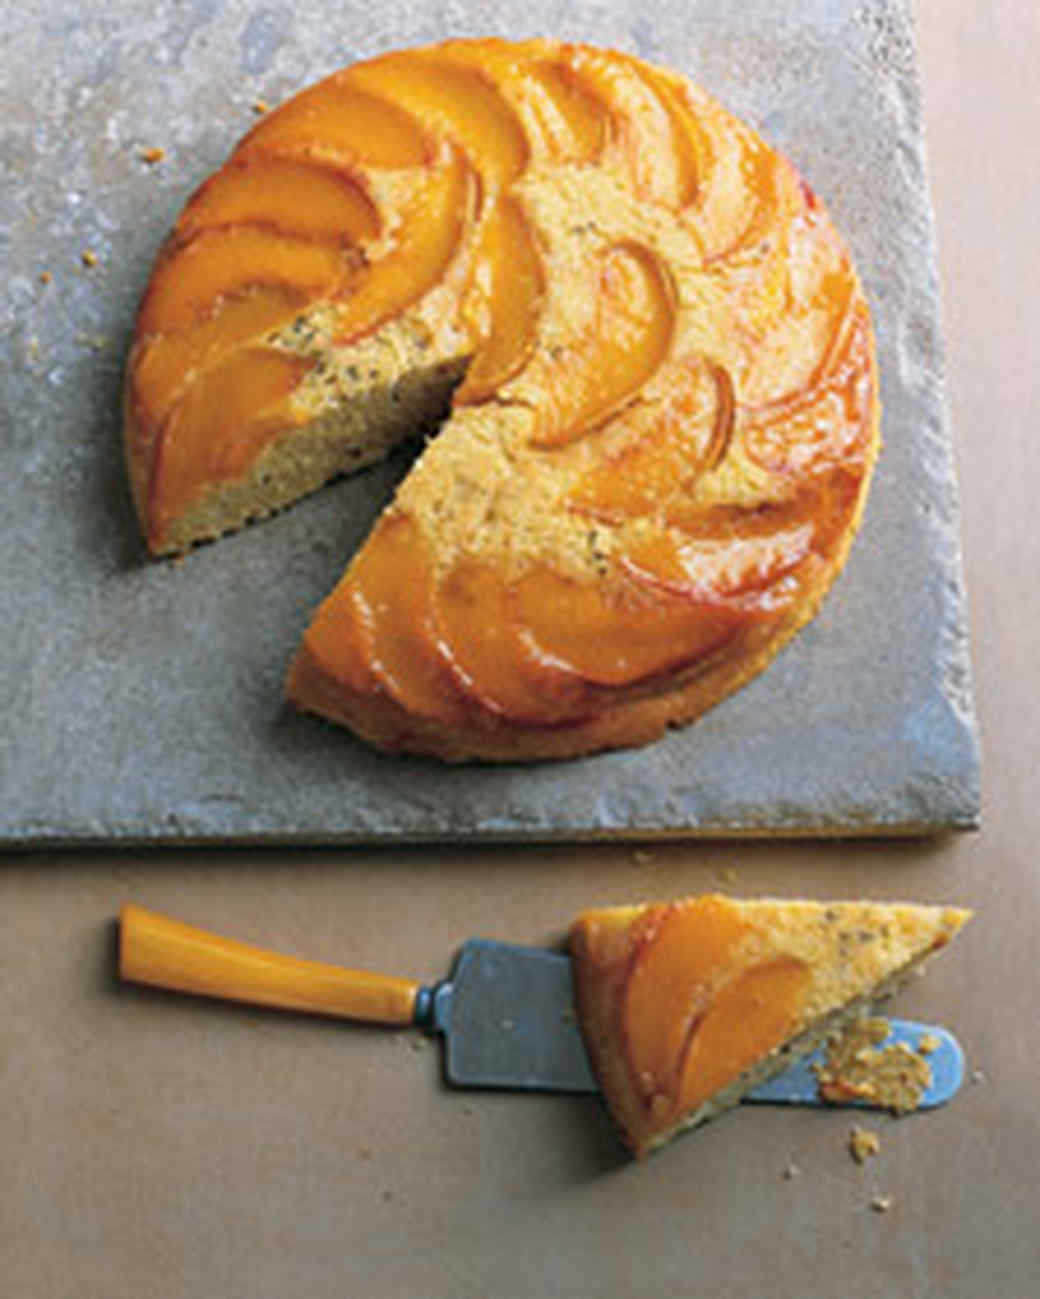 Iron Skillet Pineapple Upside Down Cake Scratch